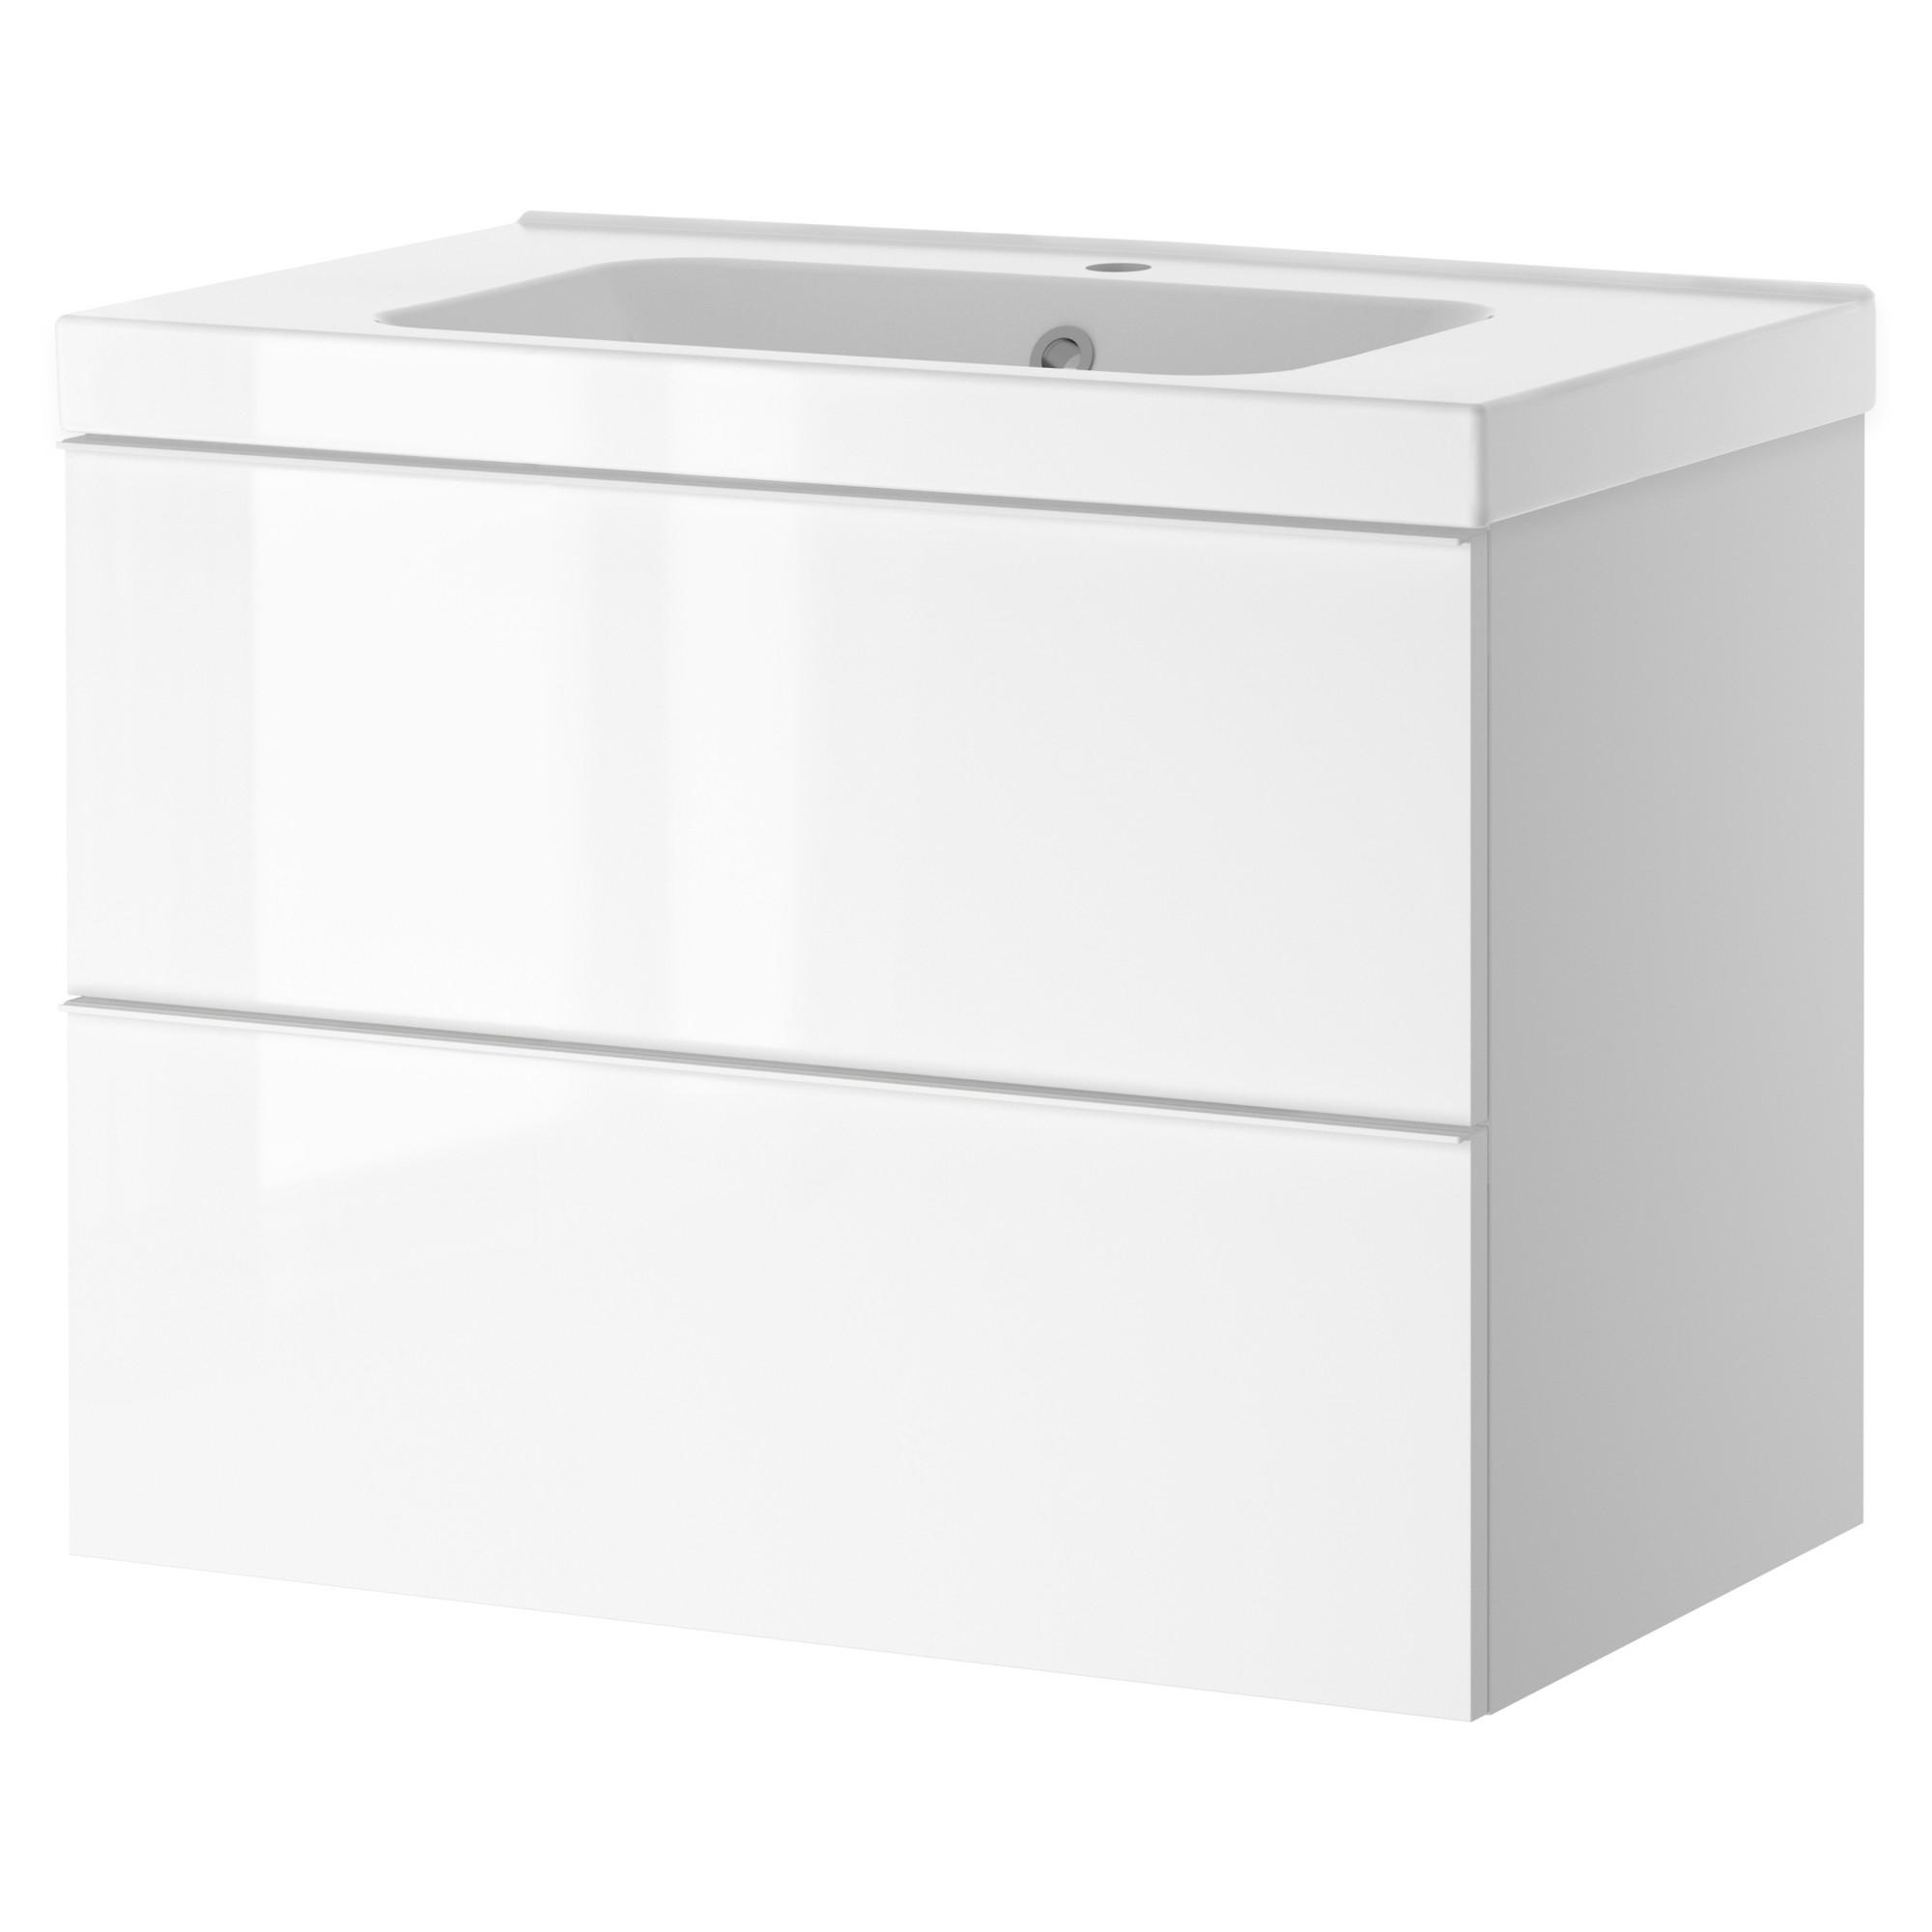 godmorgon odensvik armario lavabo 2 cajones 100cm. Black Bedroom Furniture Sets. Home Design Ideas